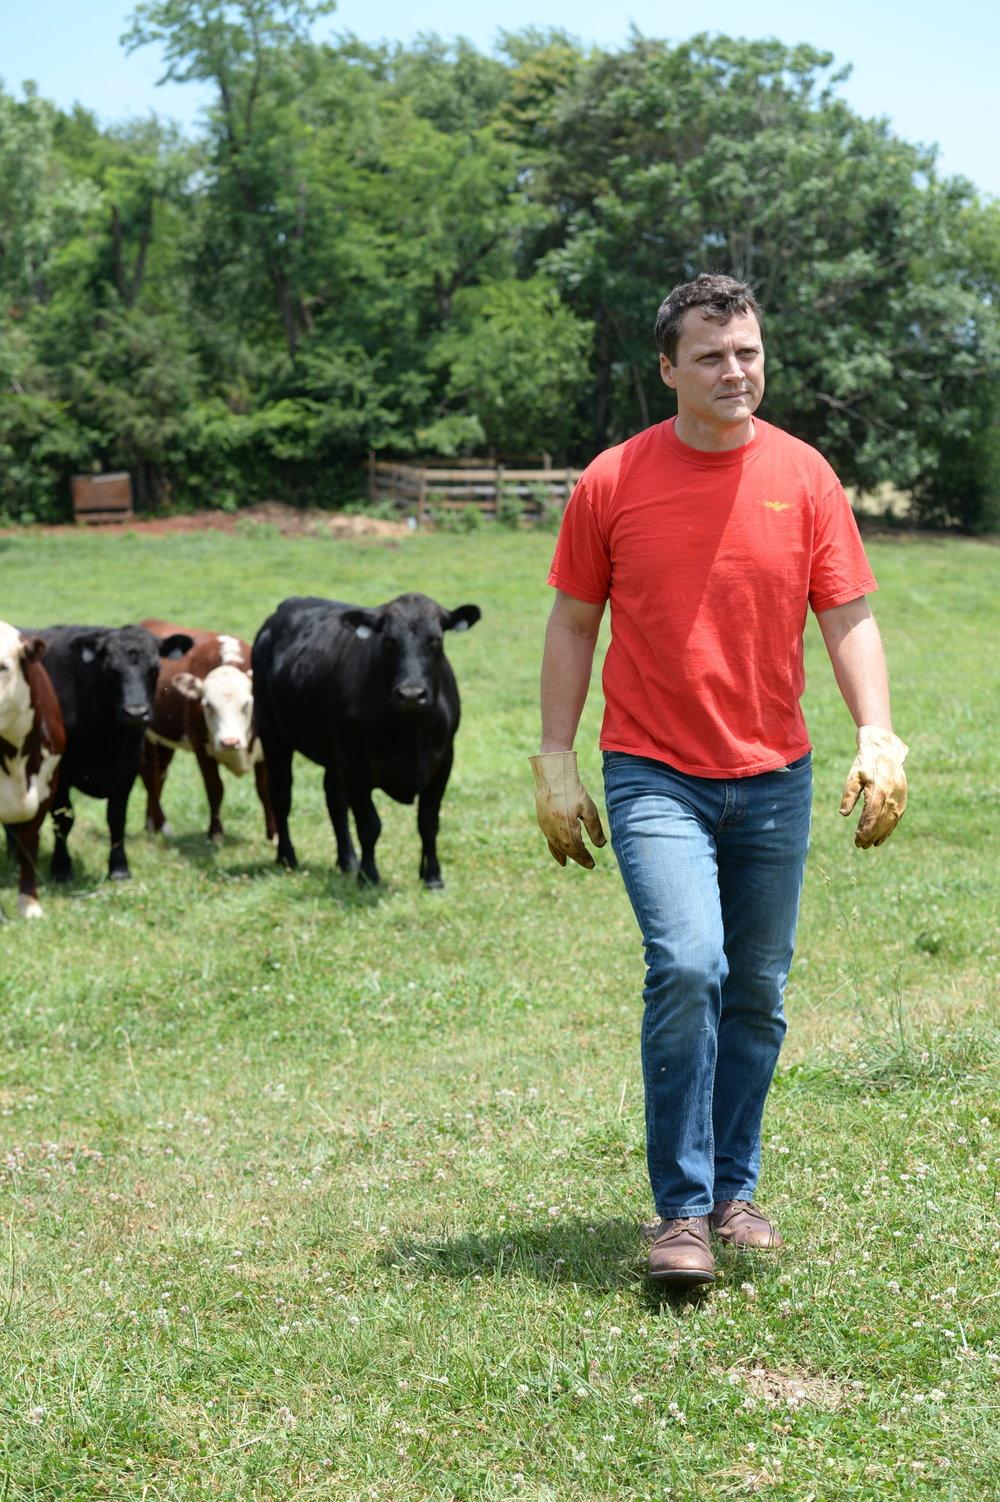 DanWard_rural-farm_2017